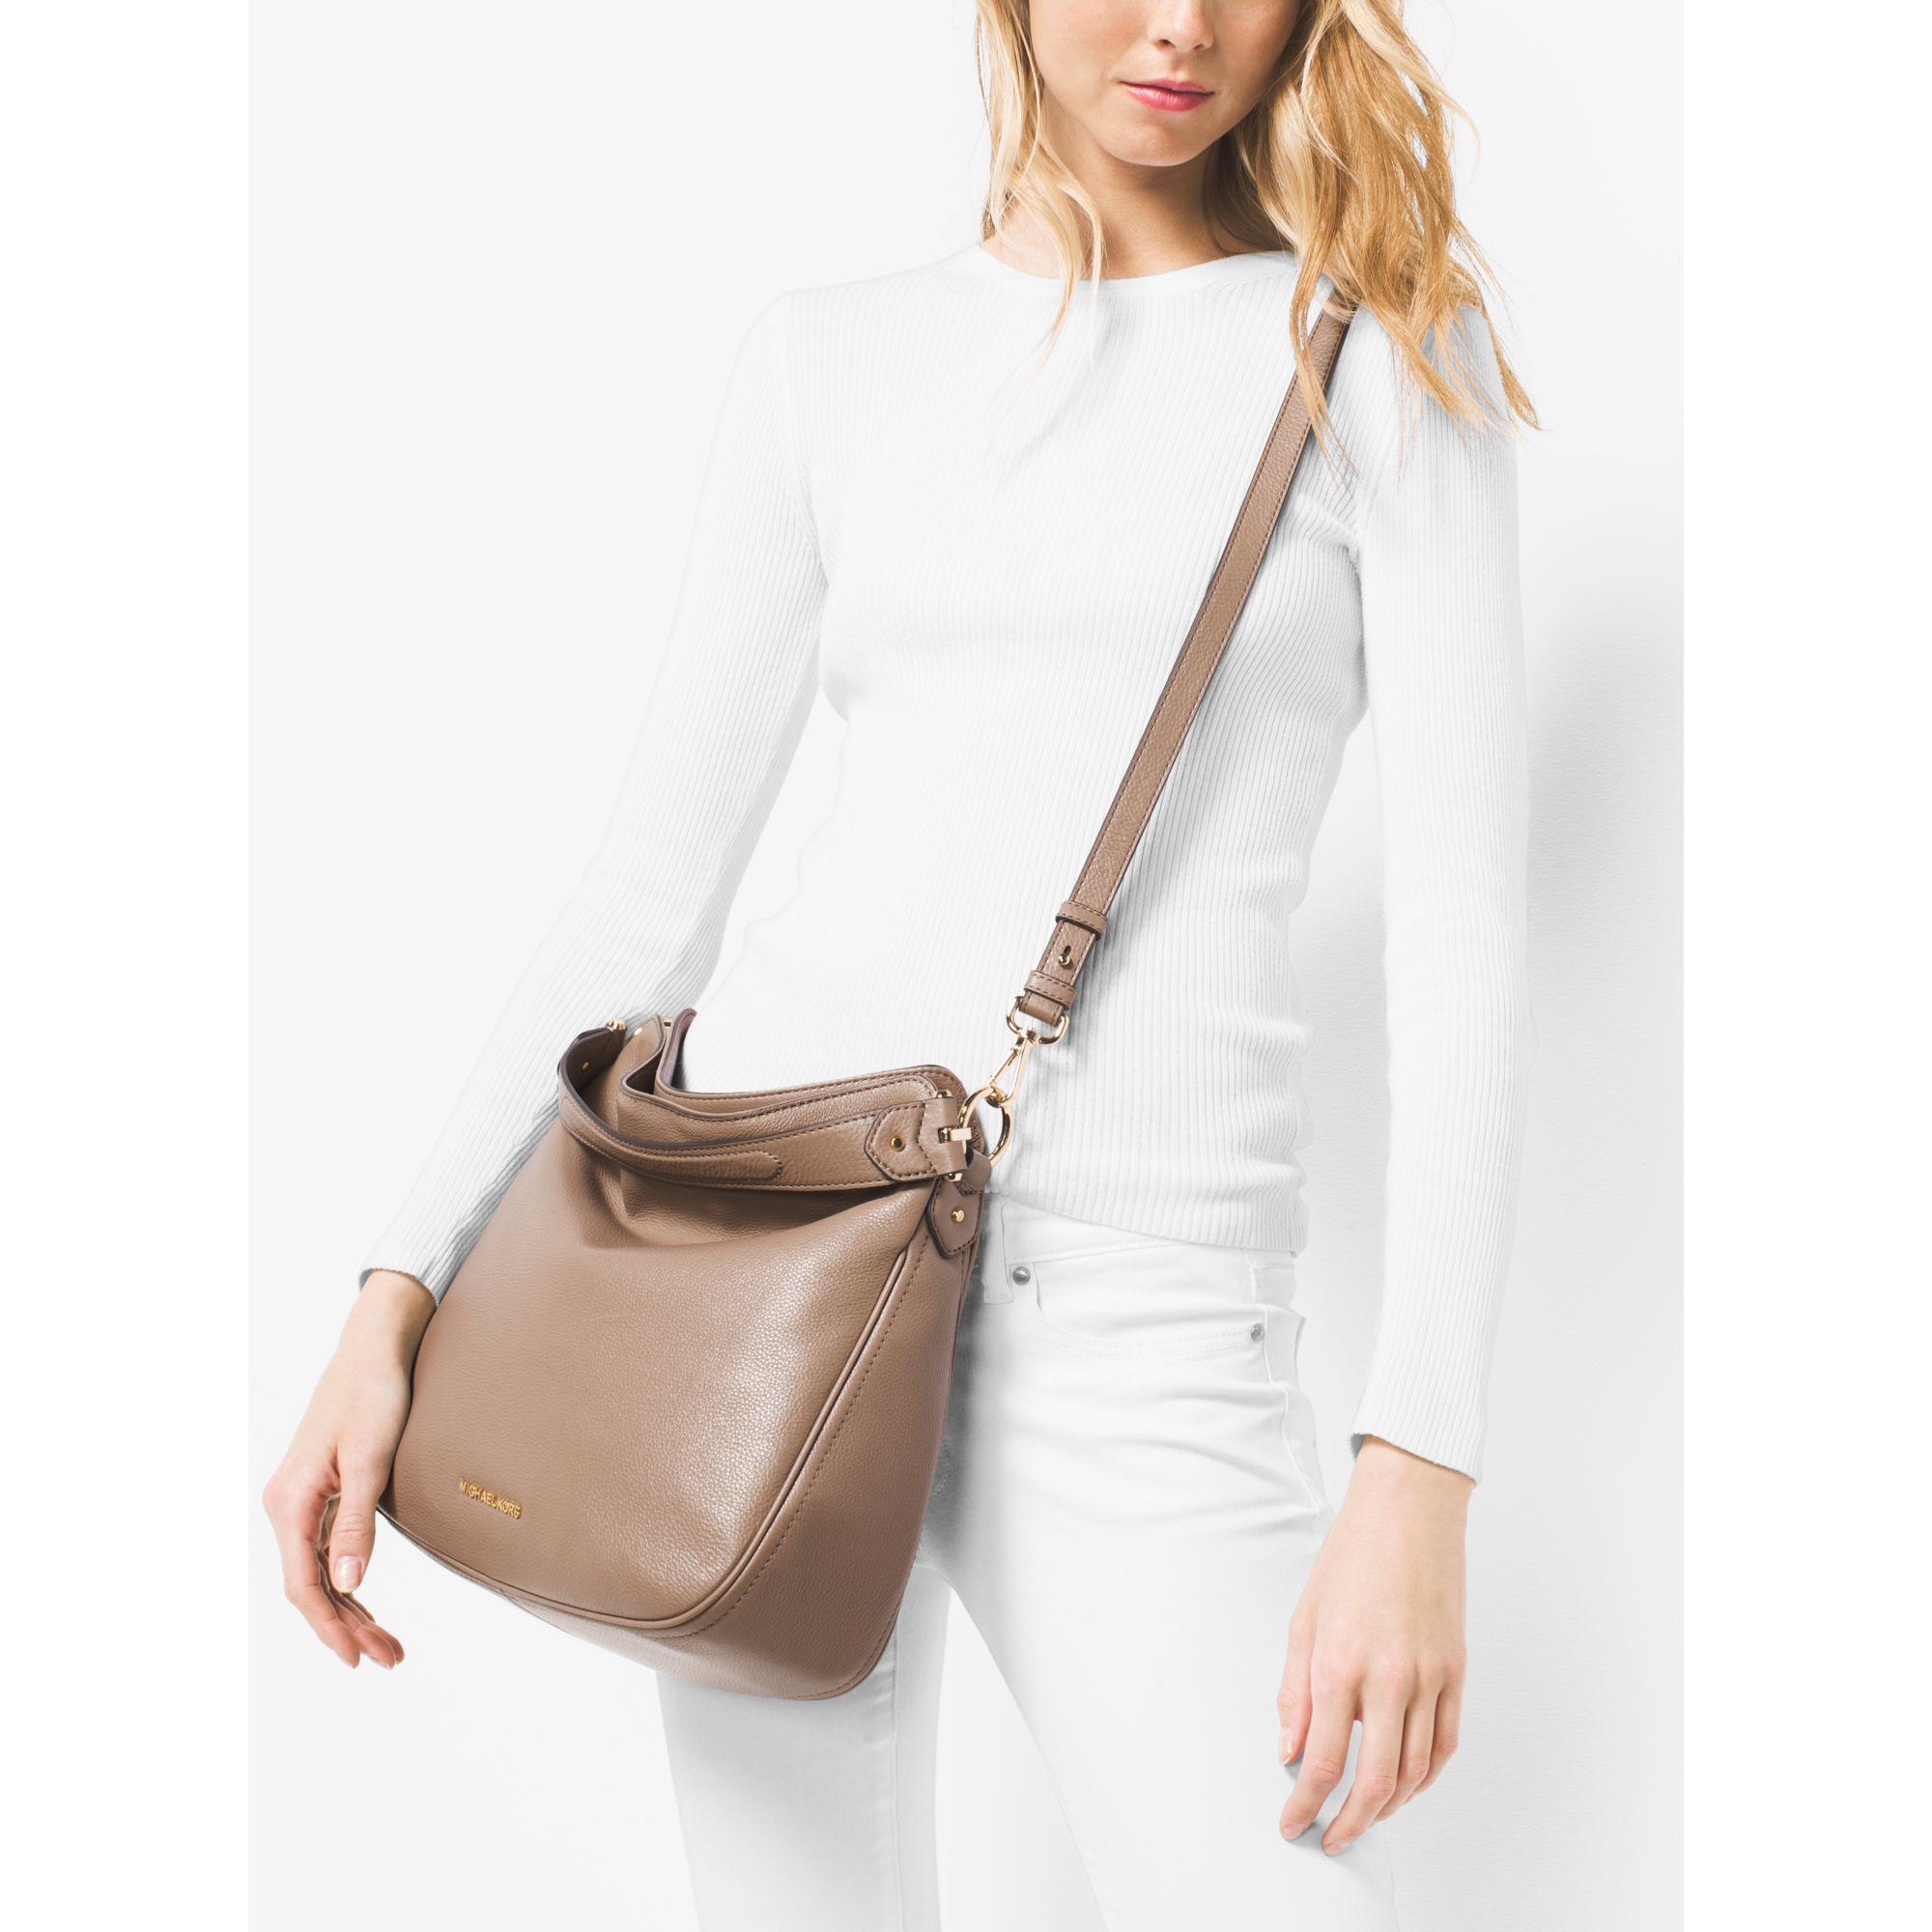 660a5f22fd Lyst - Michael Kors Heidi Medium Leather Shoulder Bag in Natural